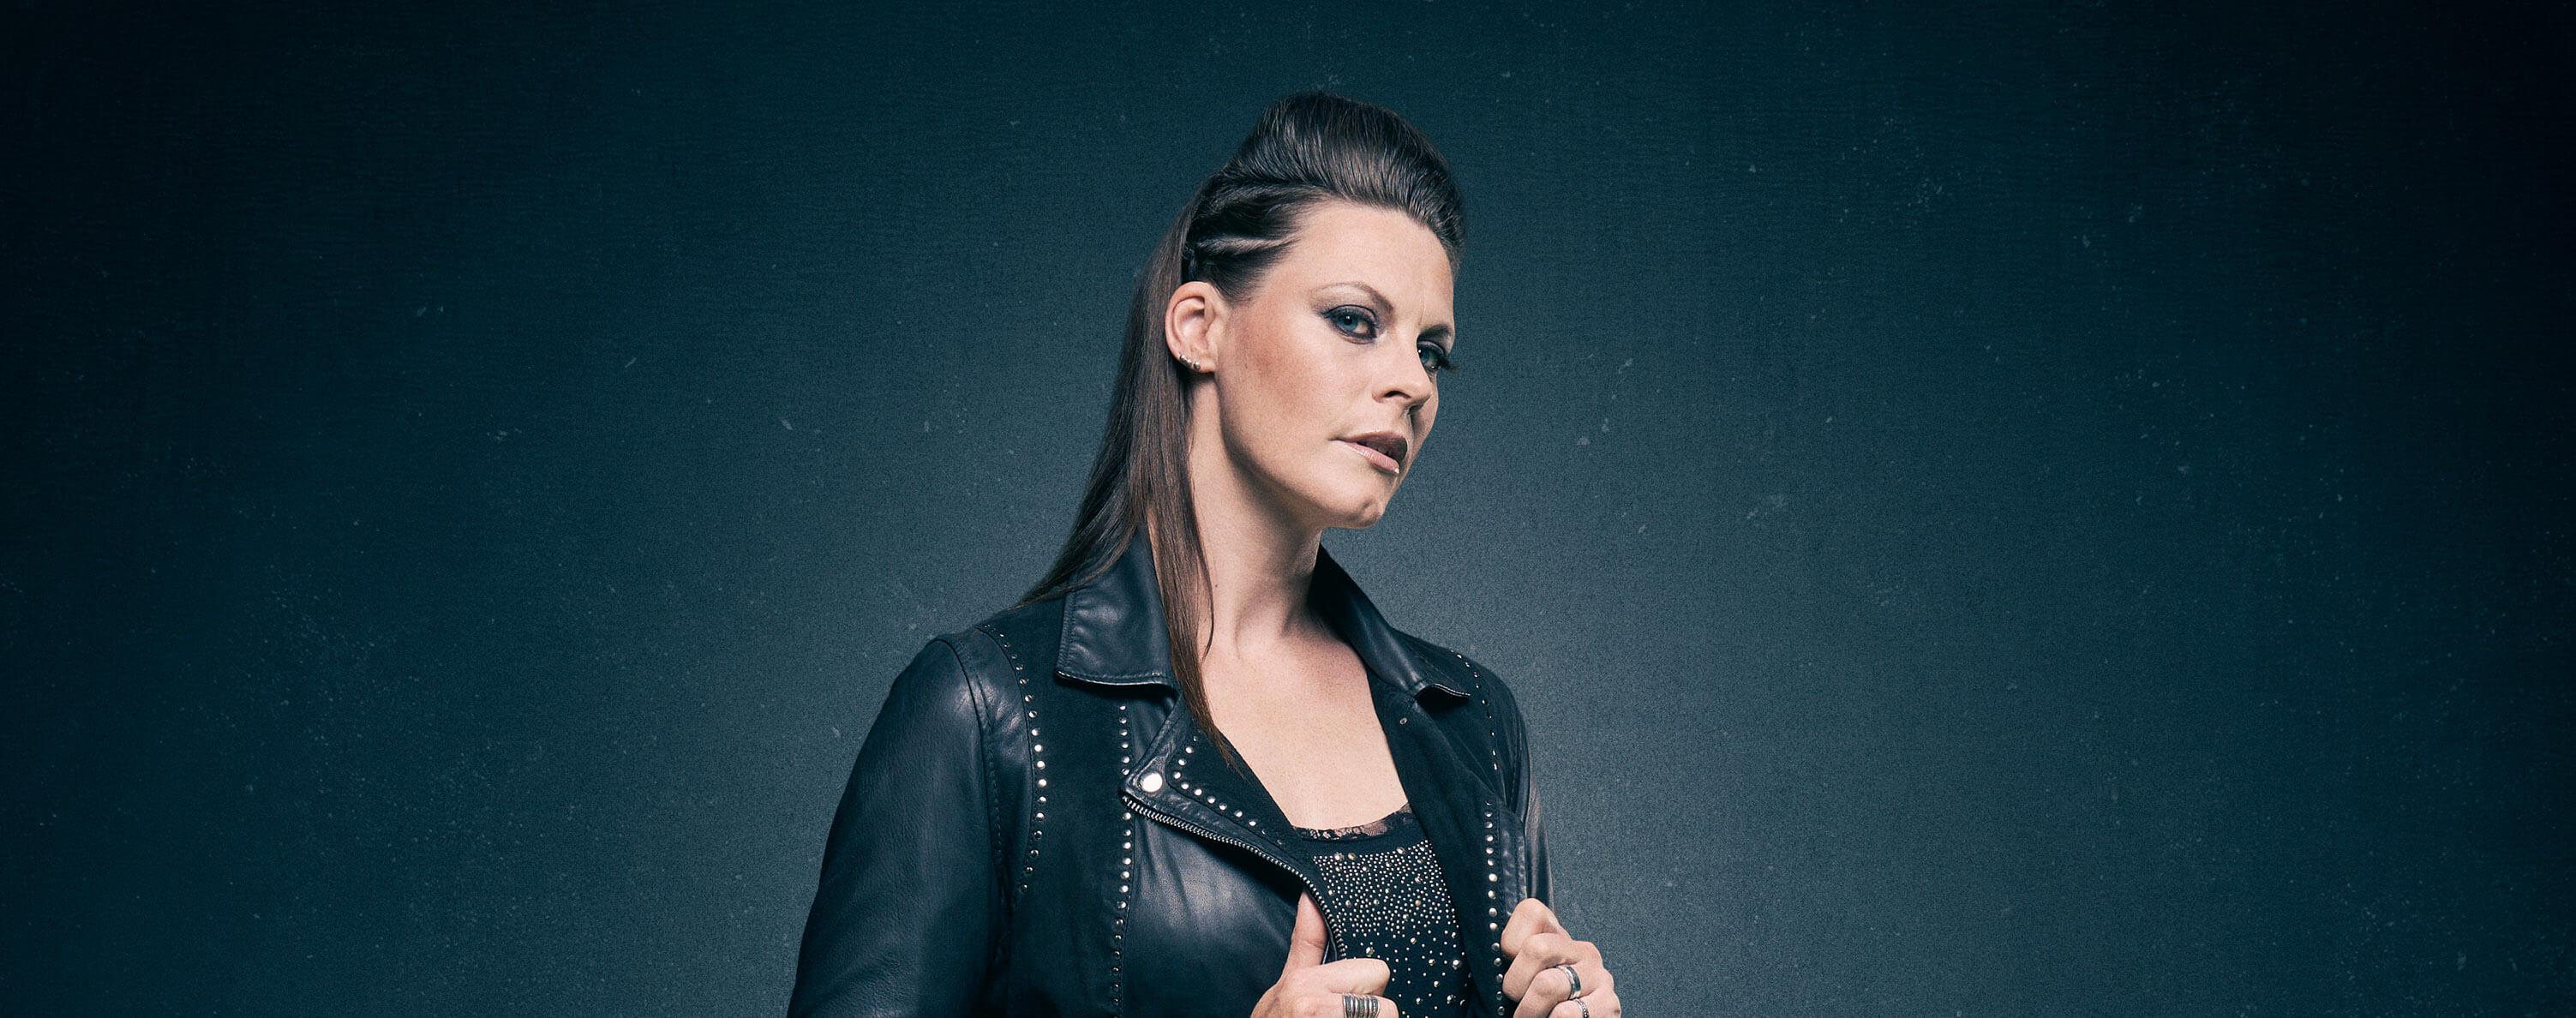 Floor Jansen partnered with EQUATION MUSIC